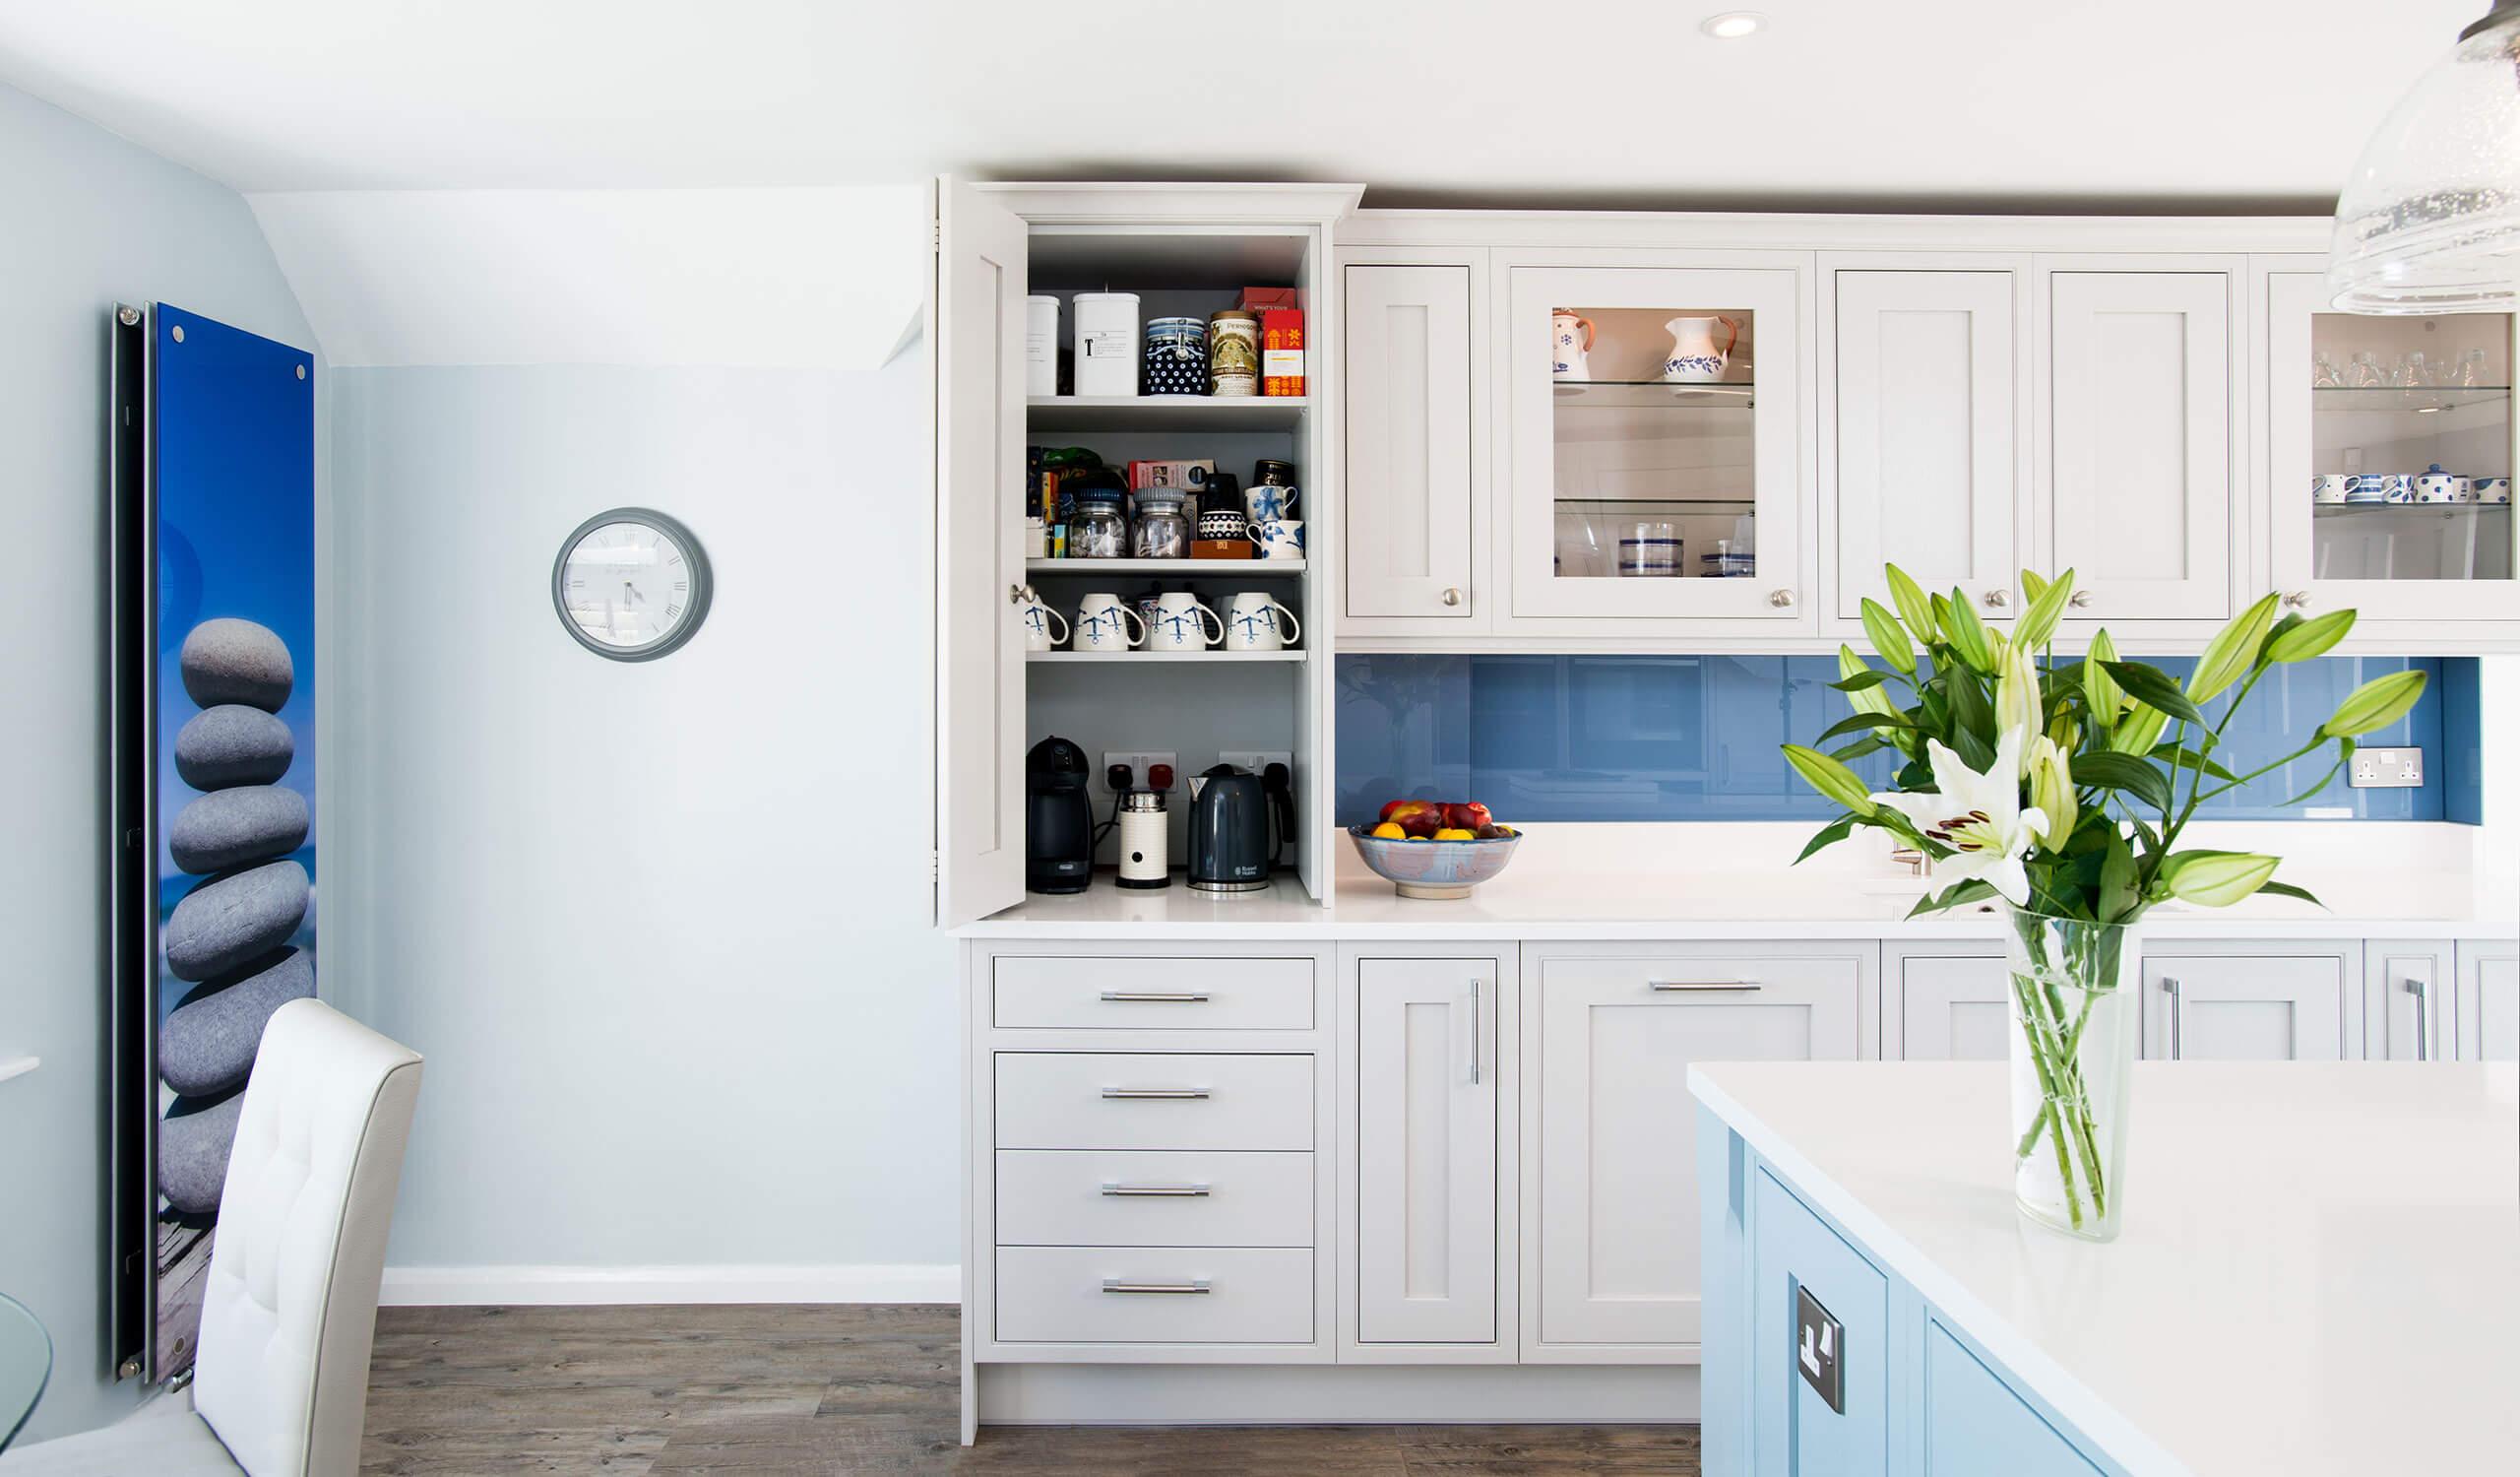 bespoke modern kitchen cabinets